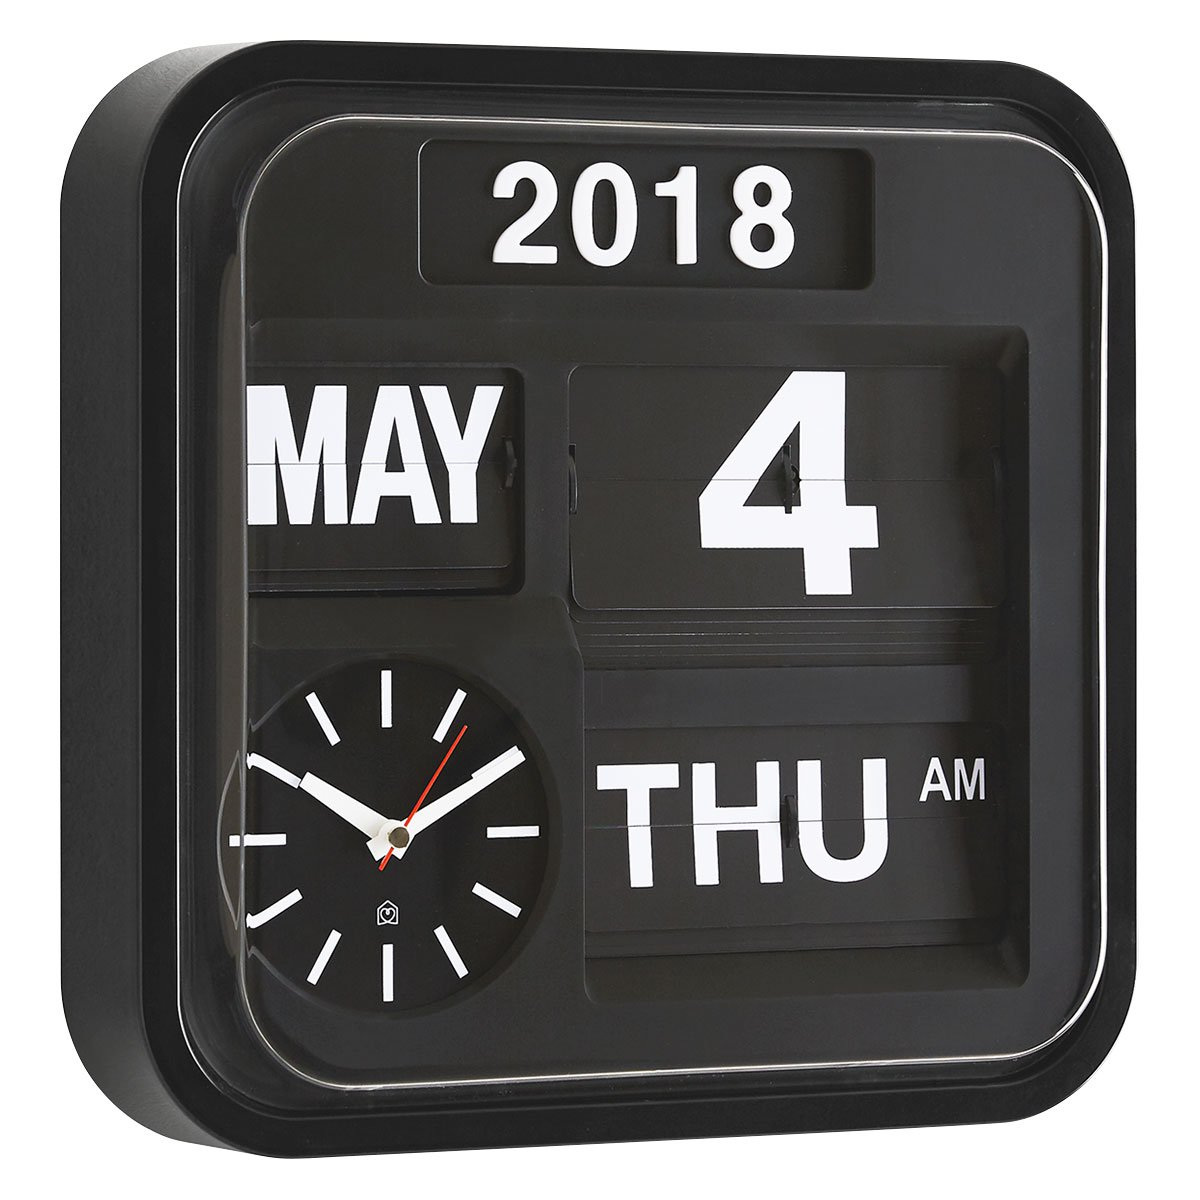 image-Flap Black Medium Analogue Year Wall Clock 32Cm, Black And White